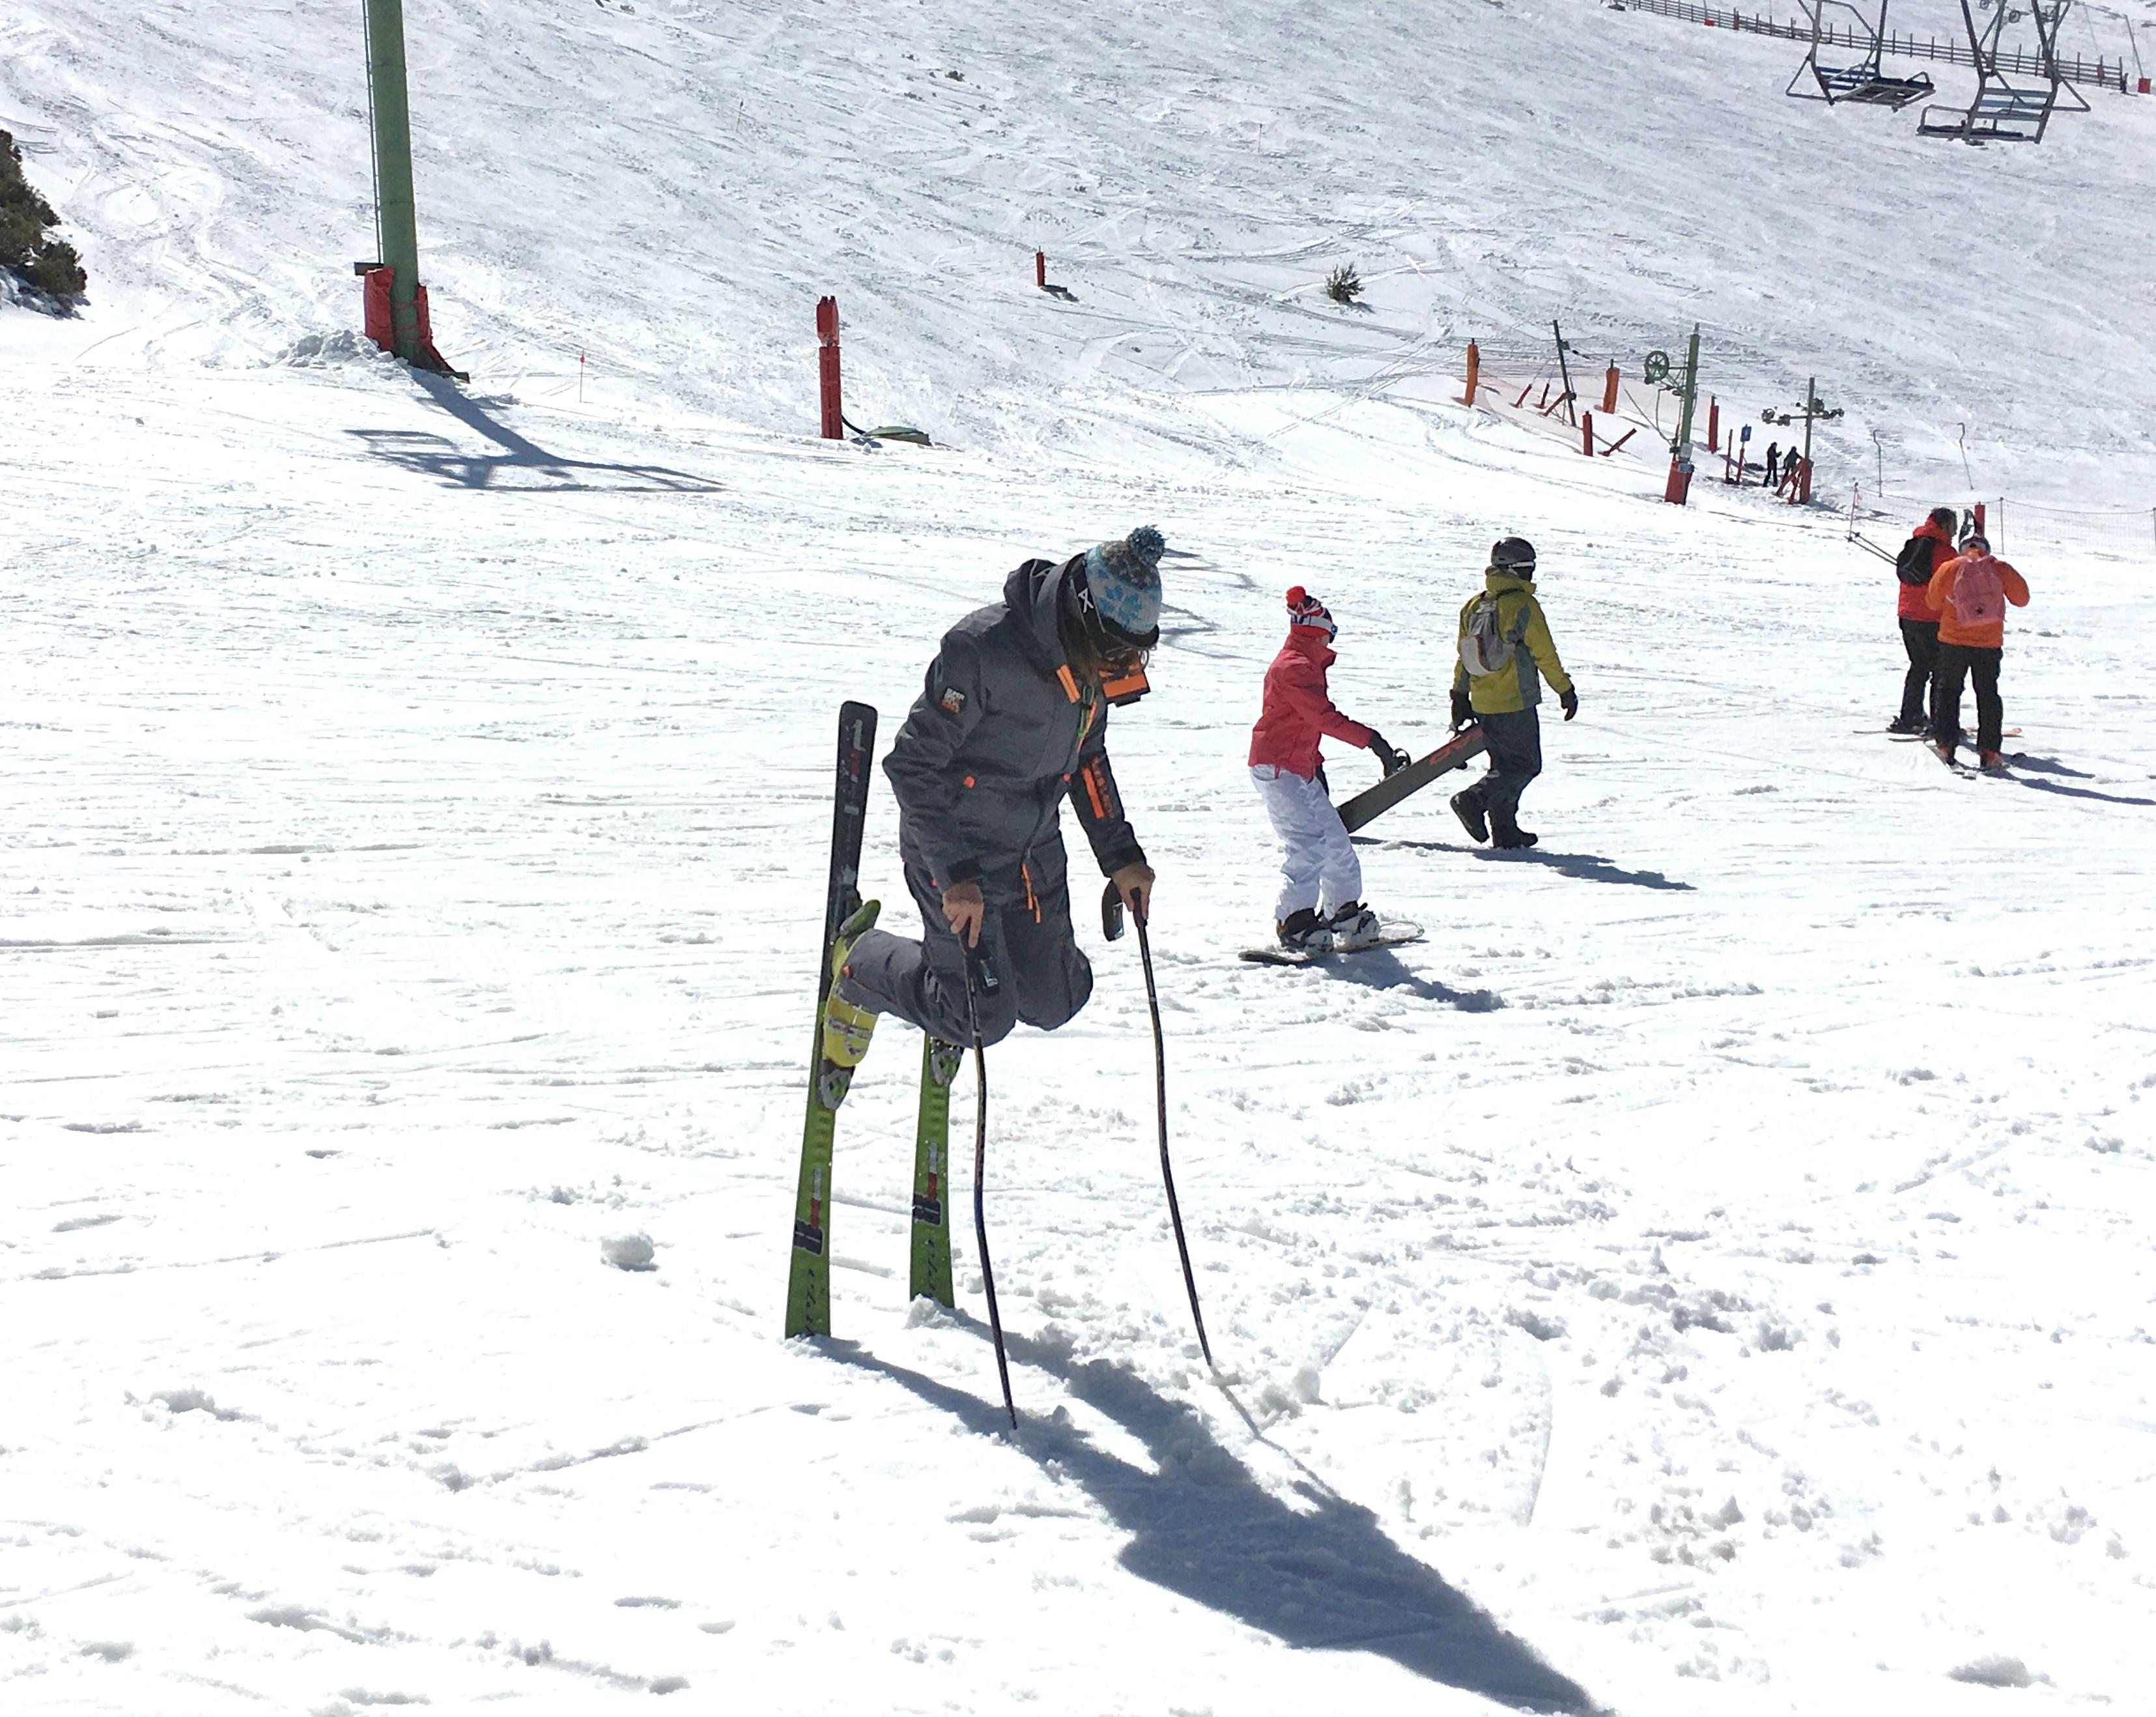 Superdry Snow Bymyheels